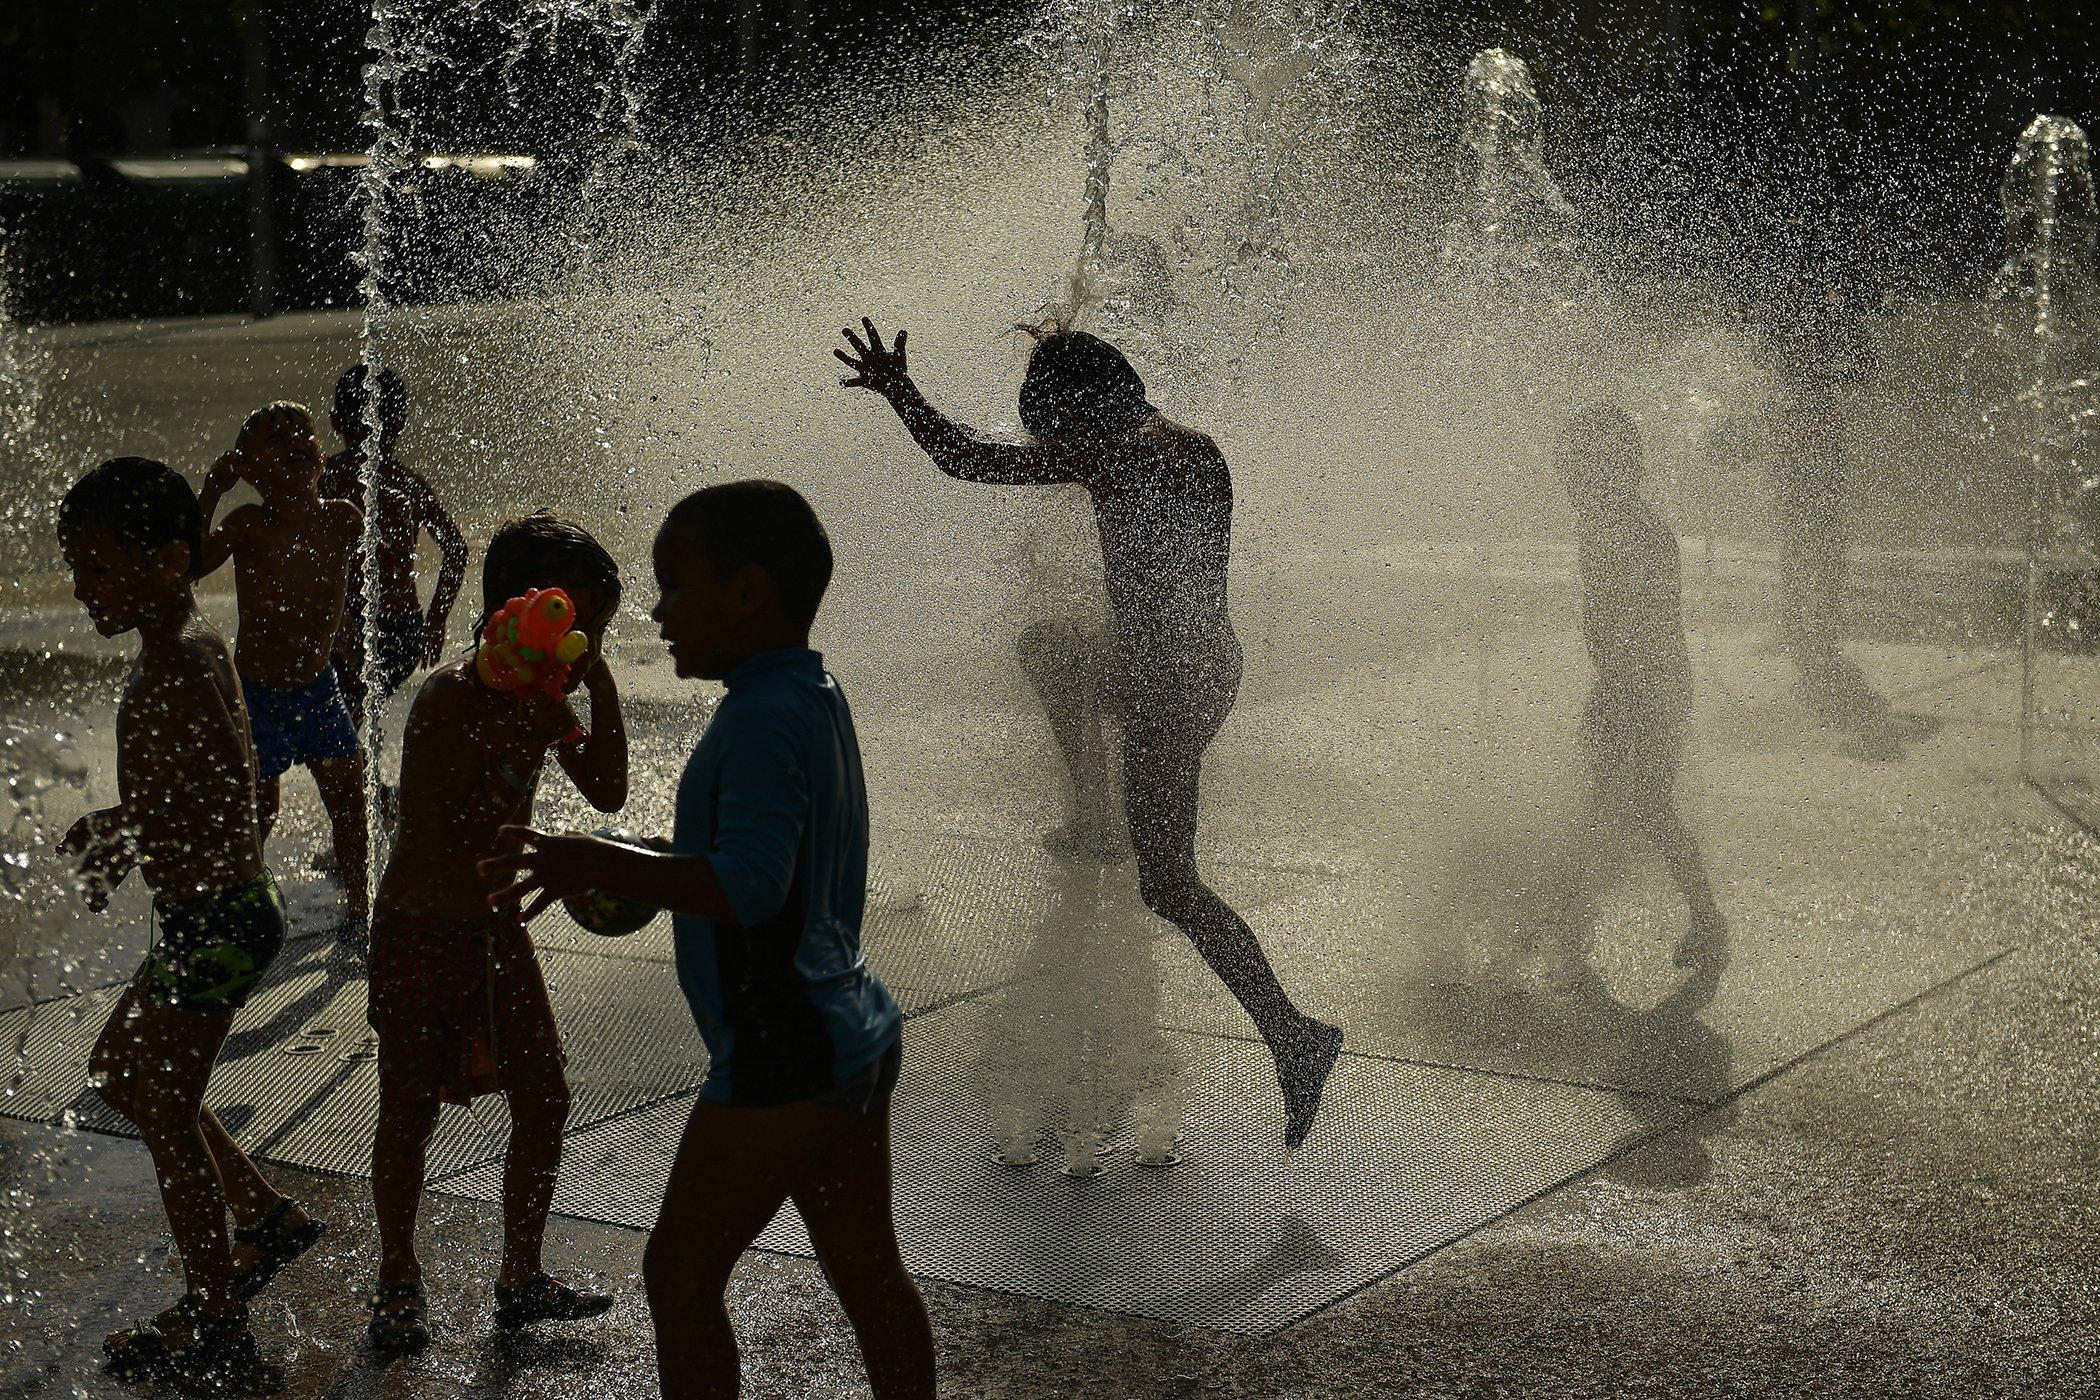 Environmental-Photos-August-Spain-Heat-Wave.jpg